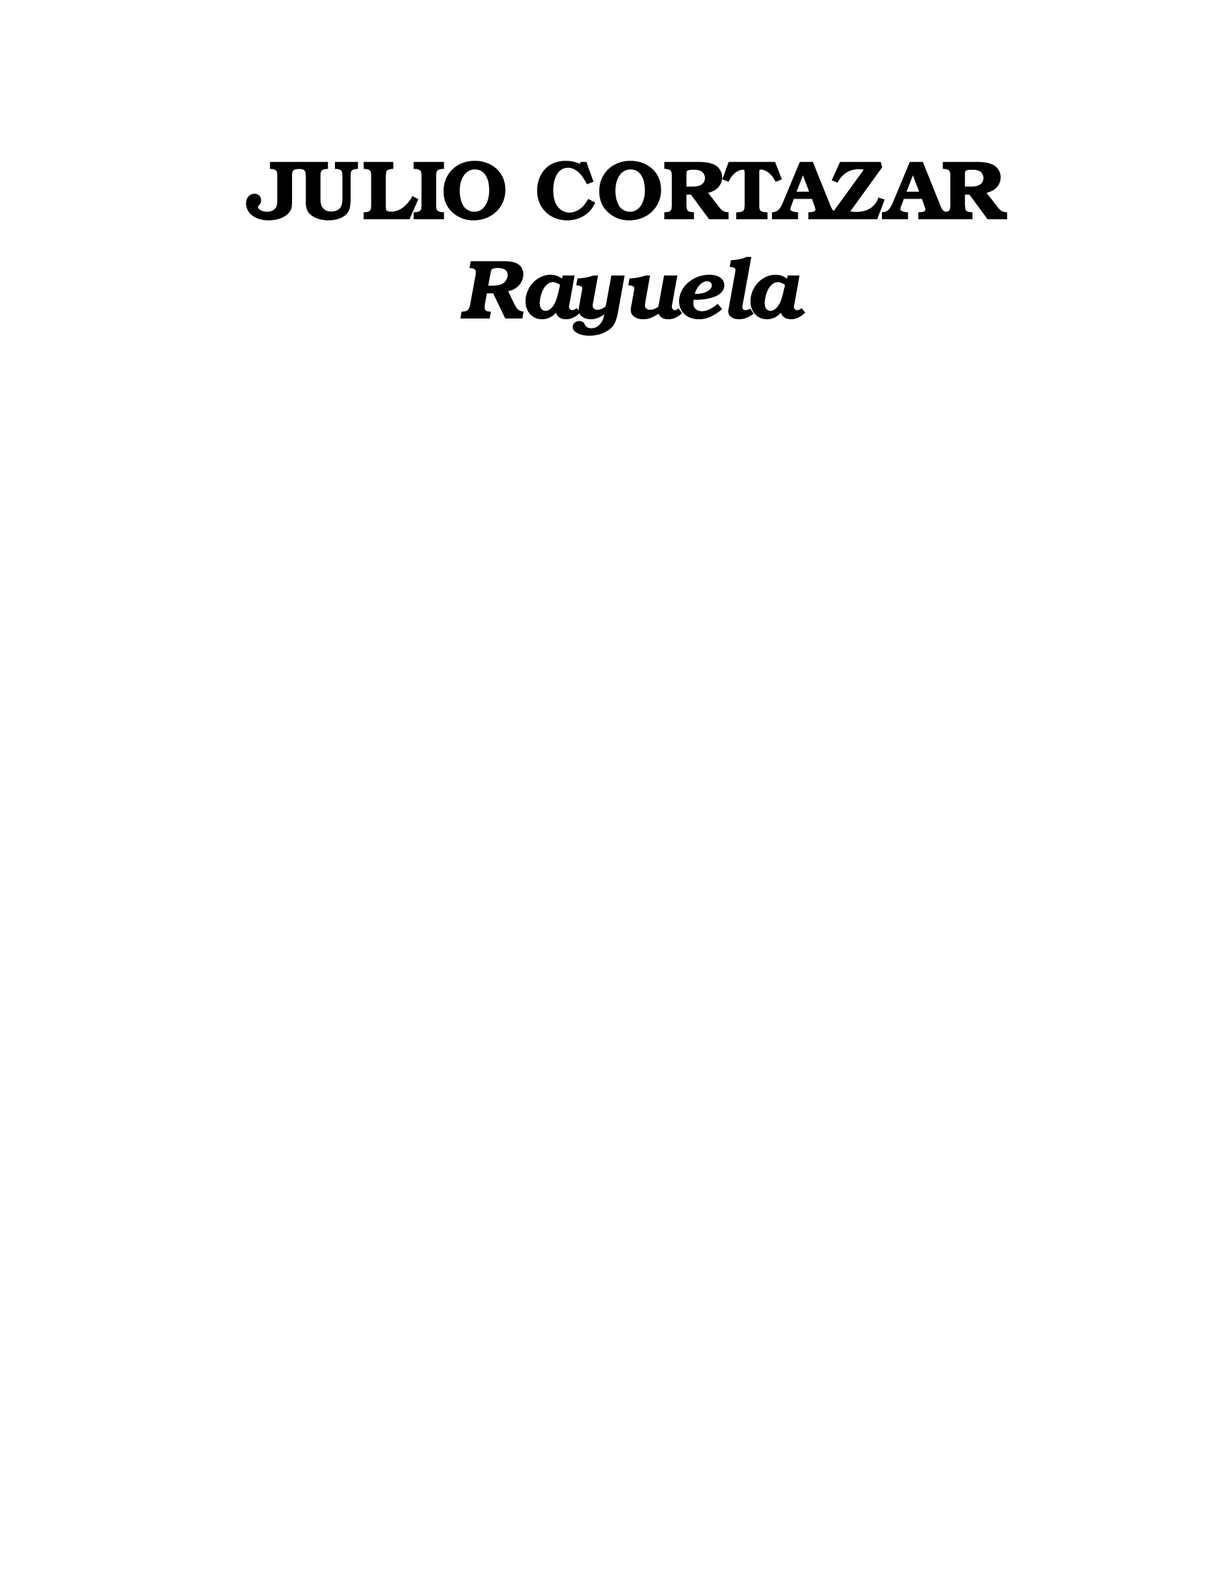 Calaméo - Rayuela Julio Cortazar